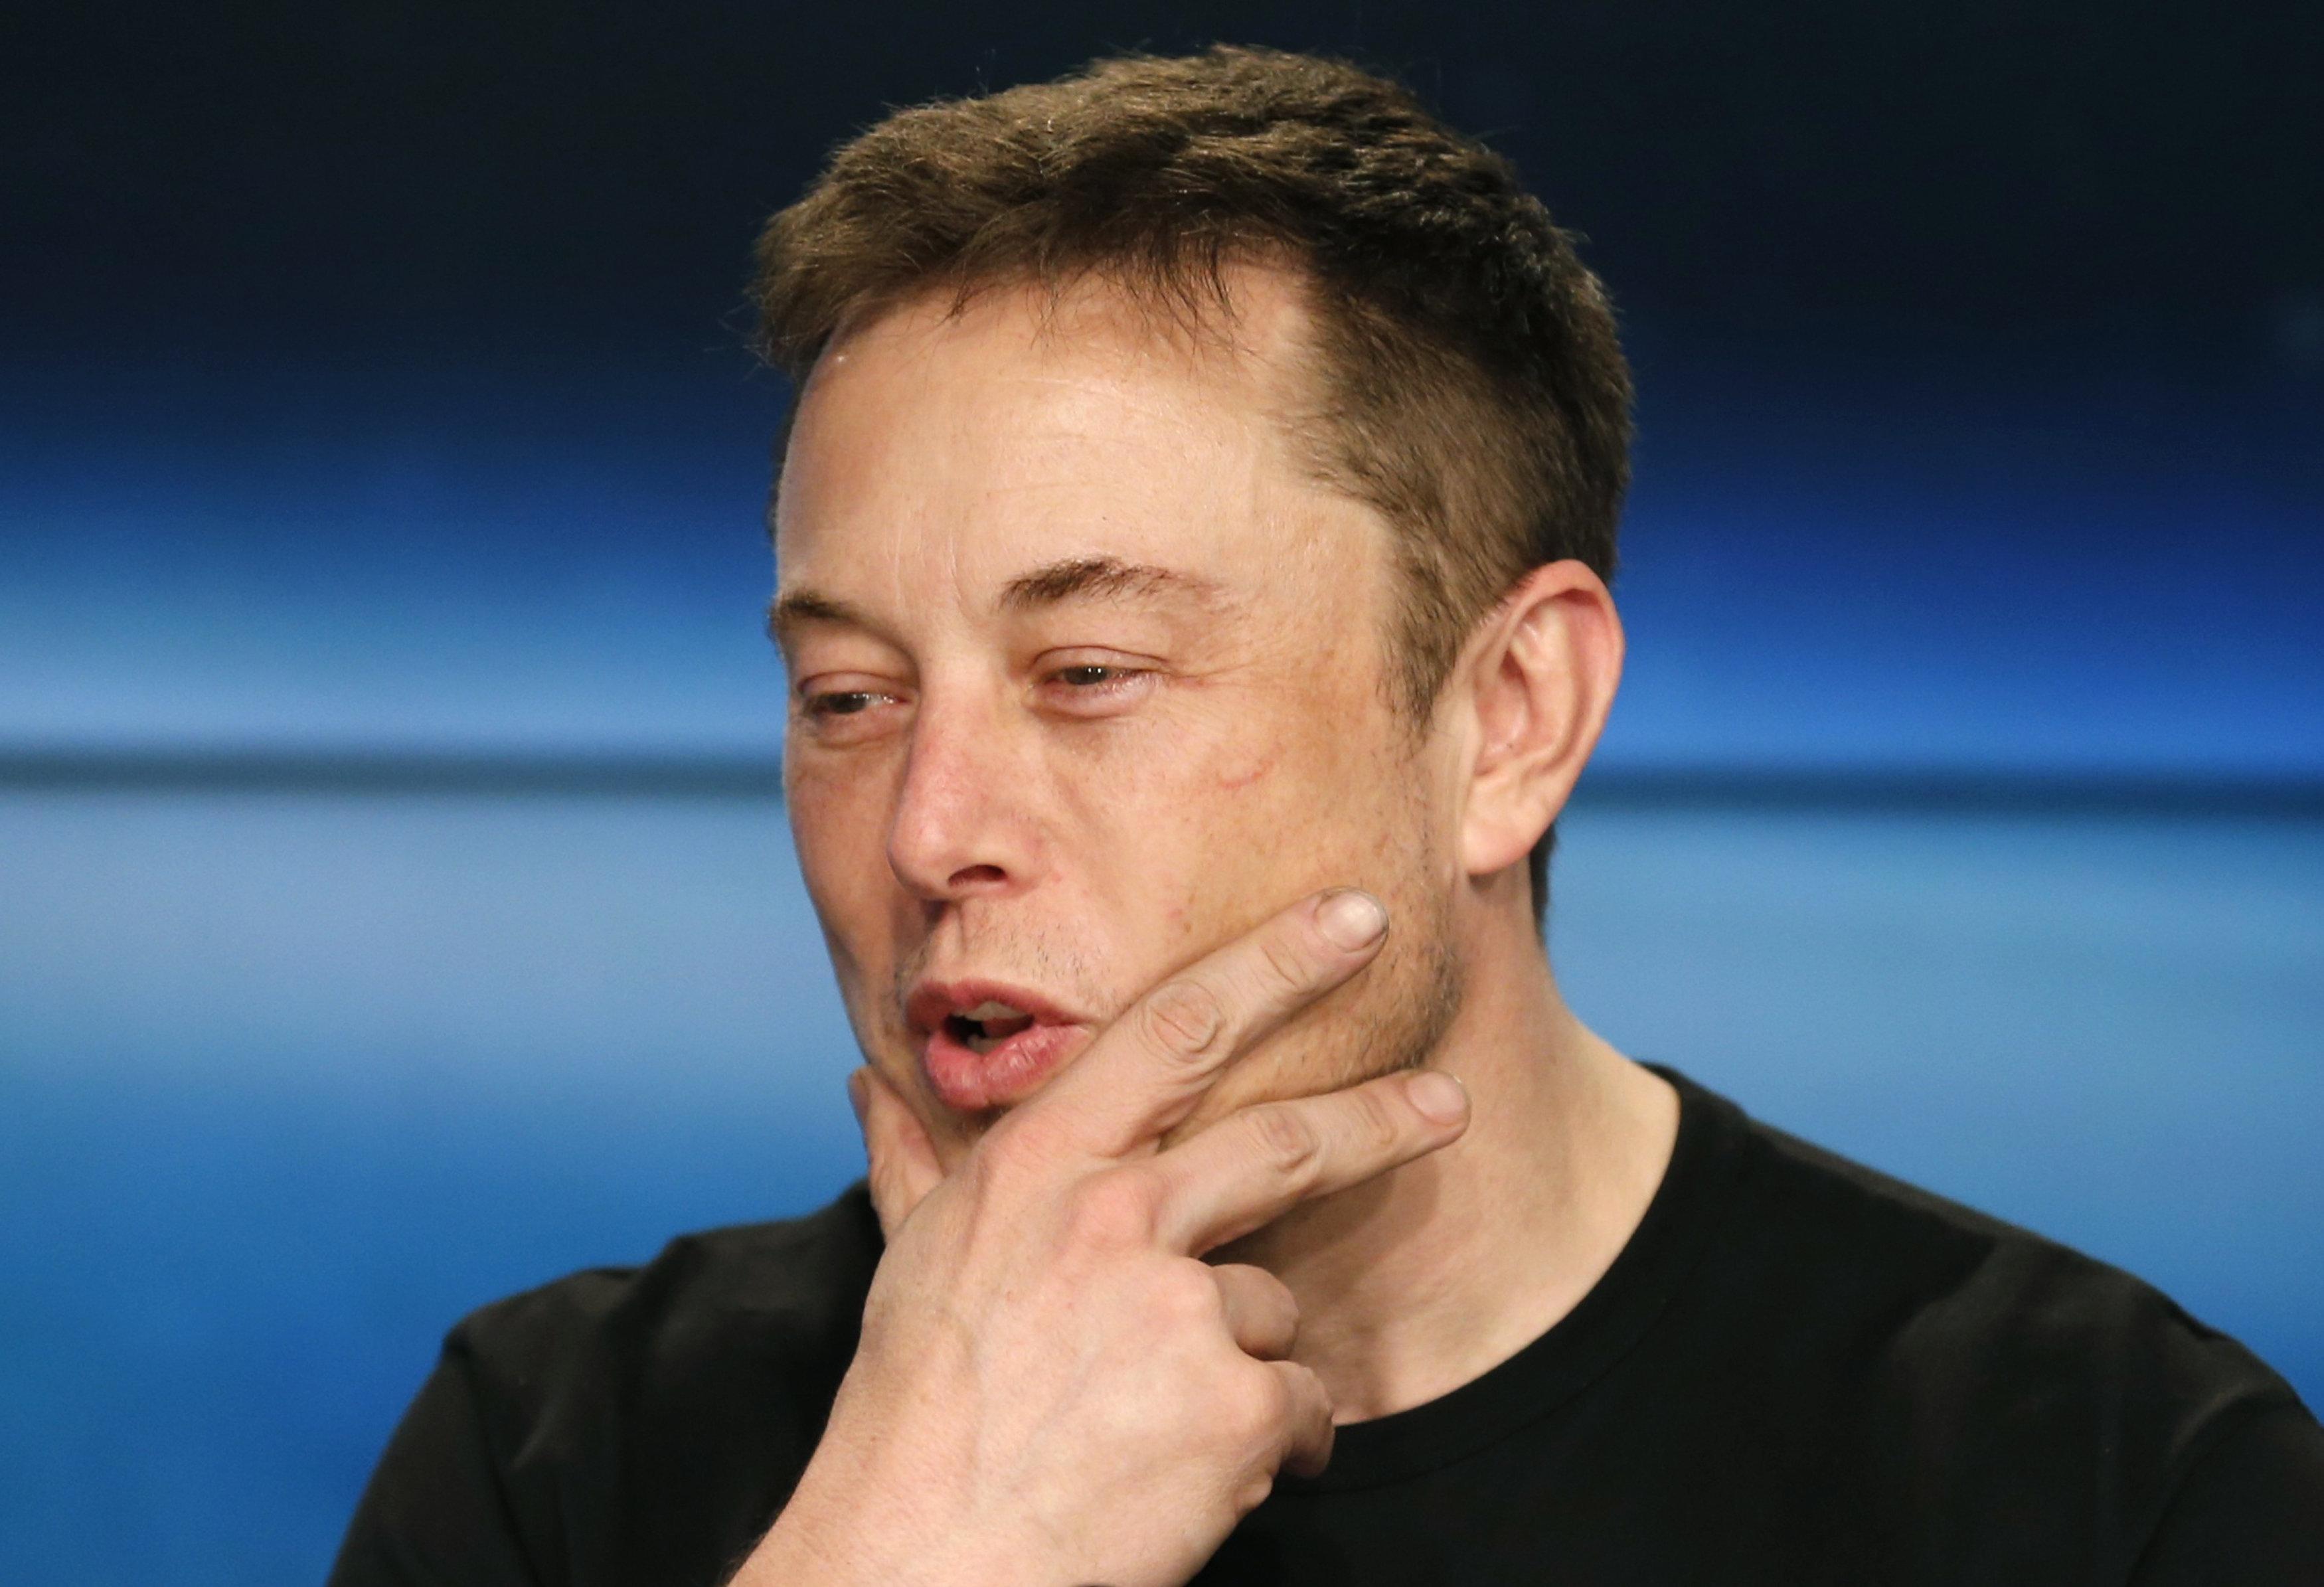 Elon Musk Tweets Prompt Criminal Probe By Justice Department